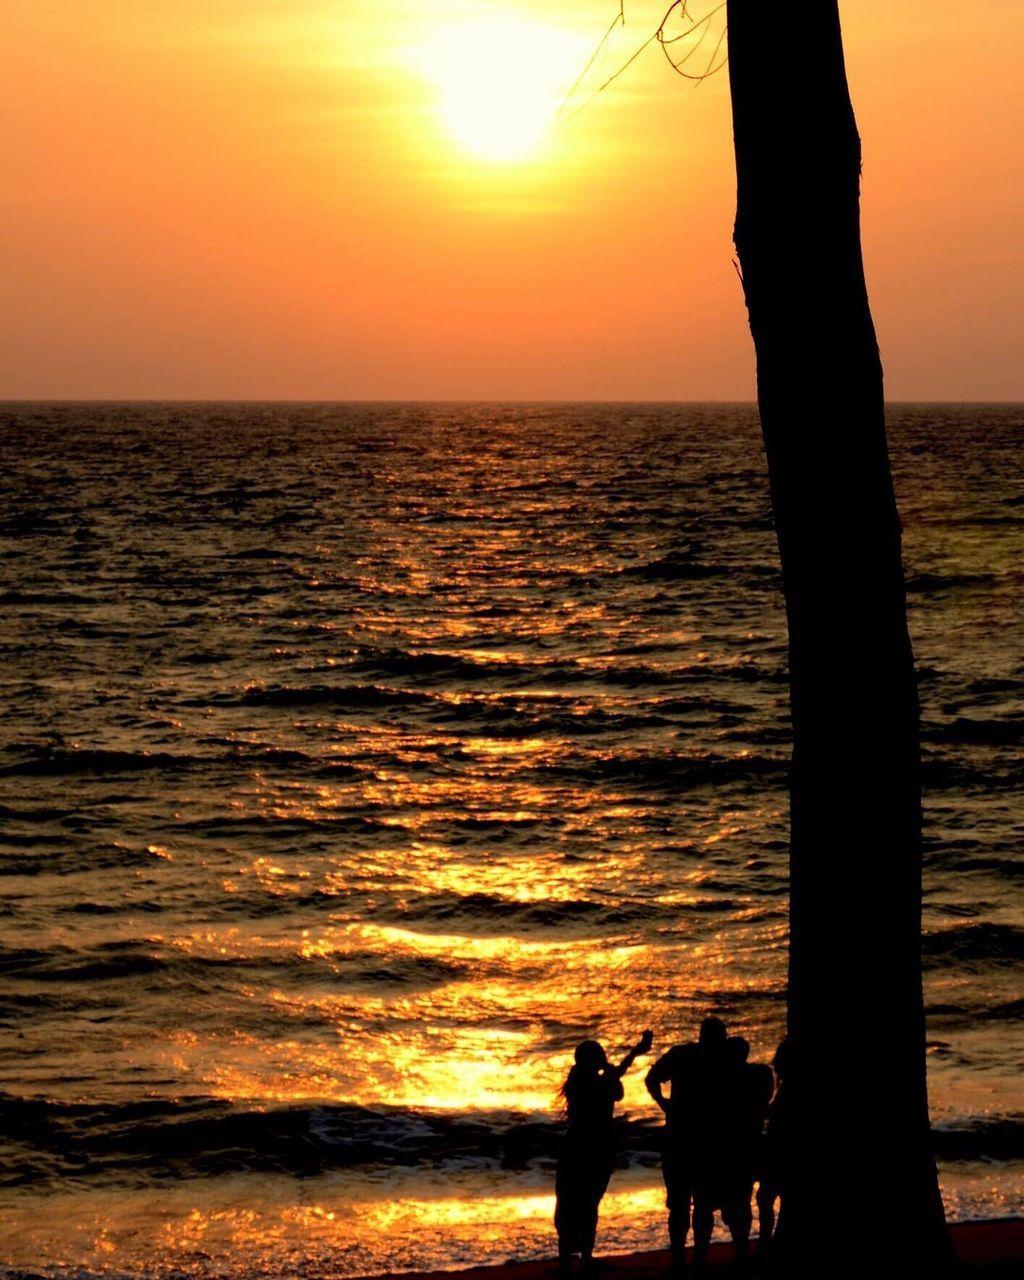 SILHOUETTE PEOPLE ENJOYING IN SEA AGAINST SUNSET SKY